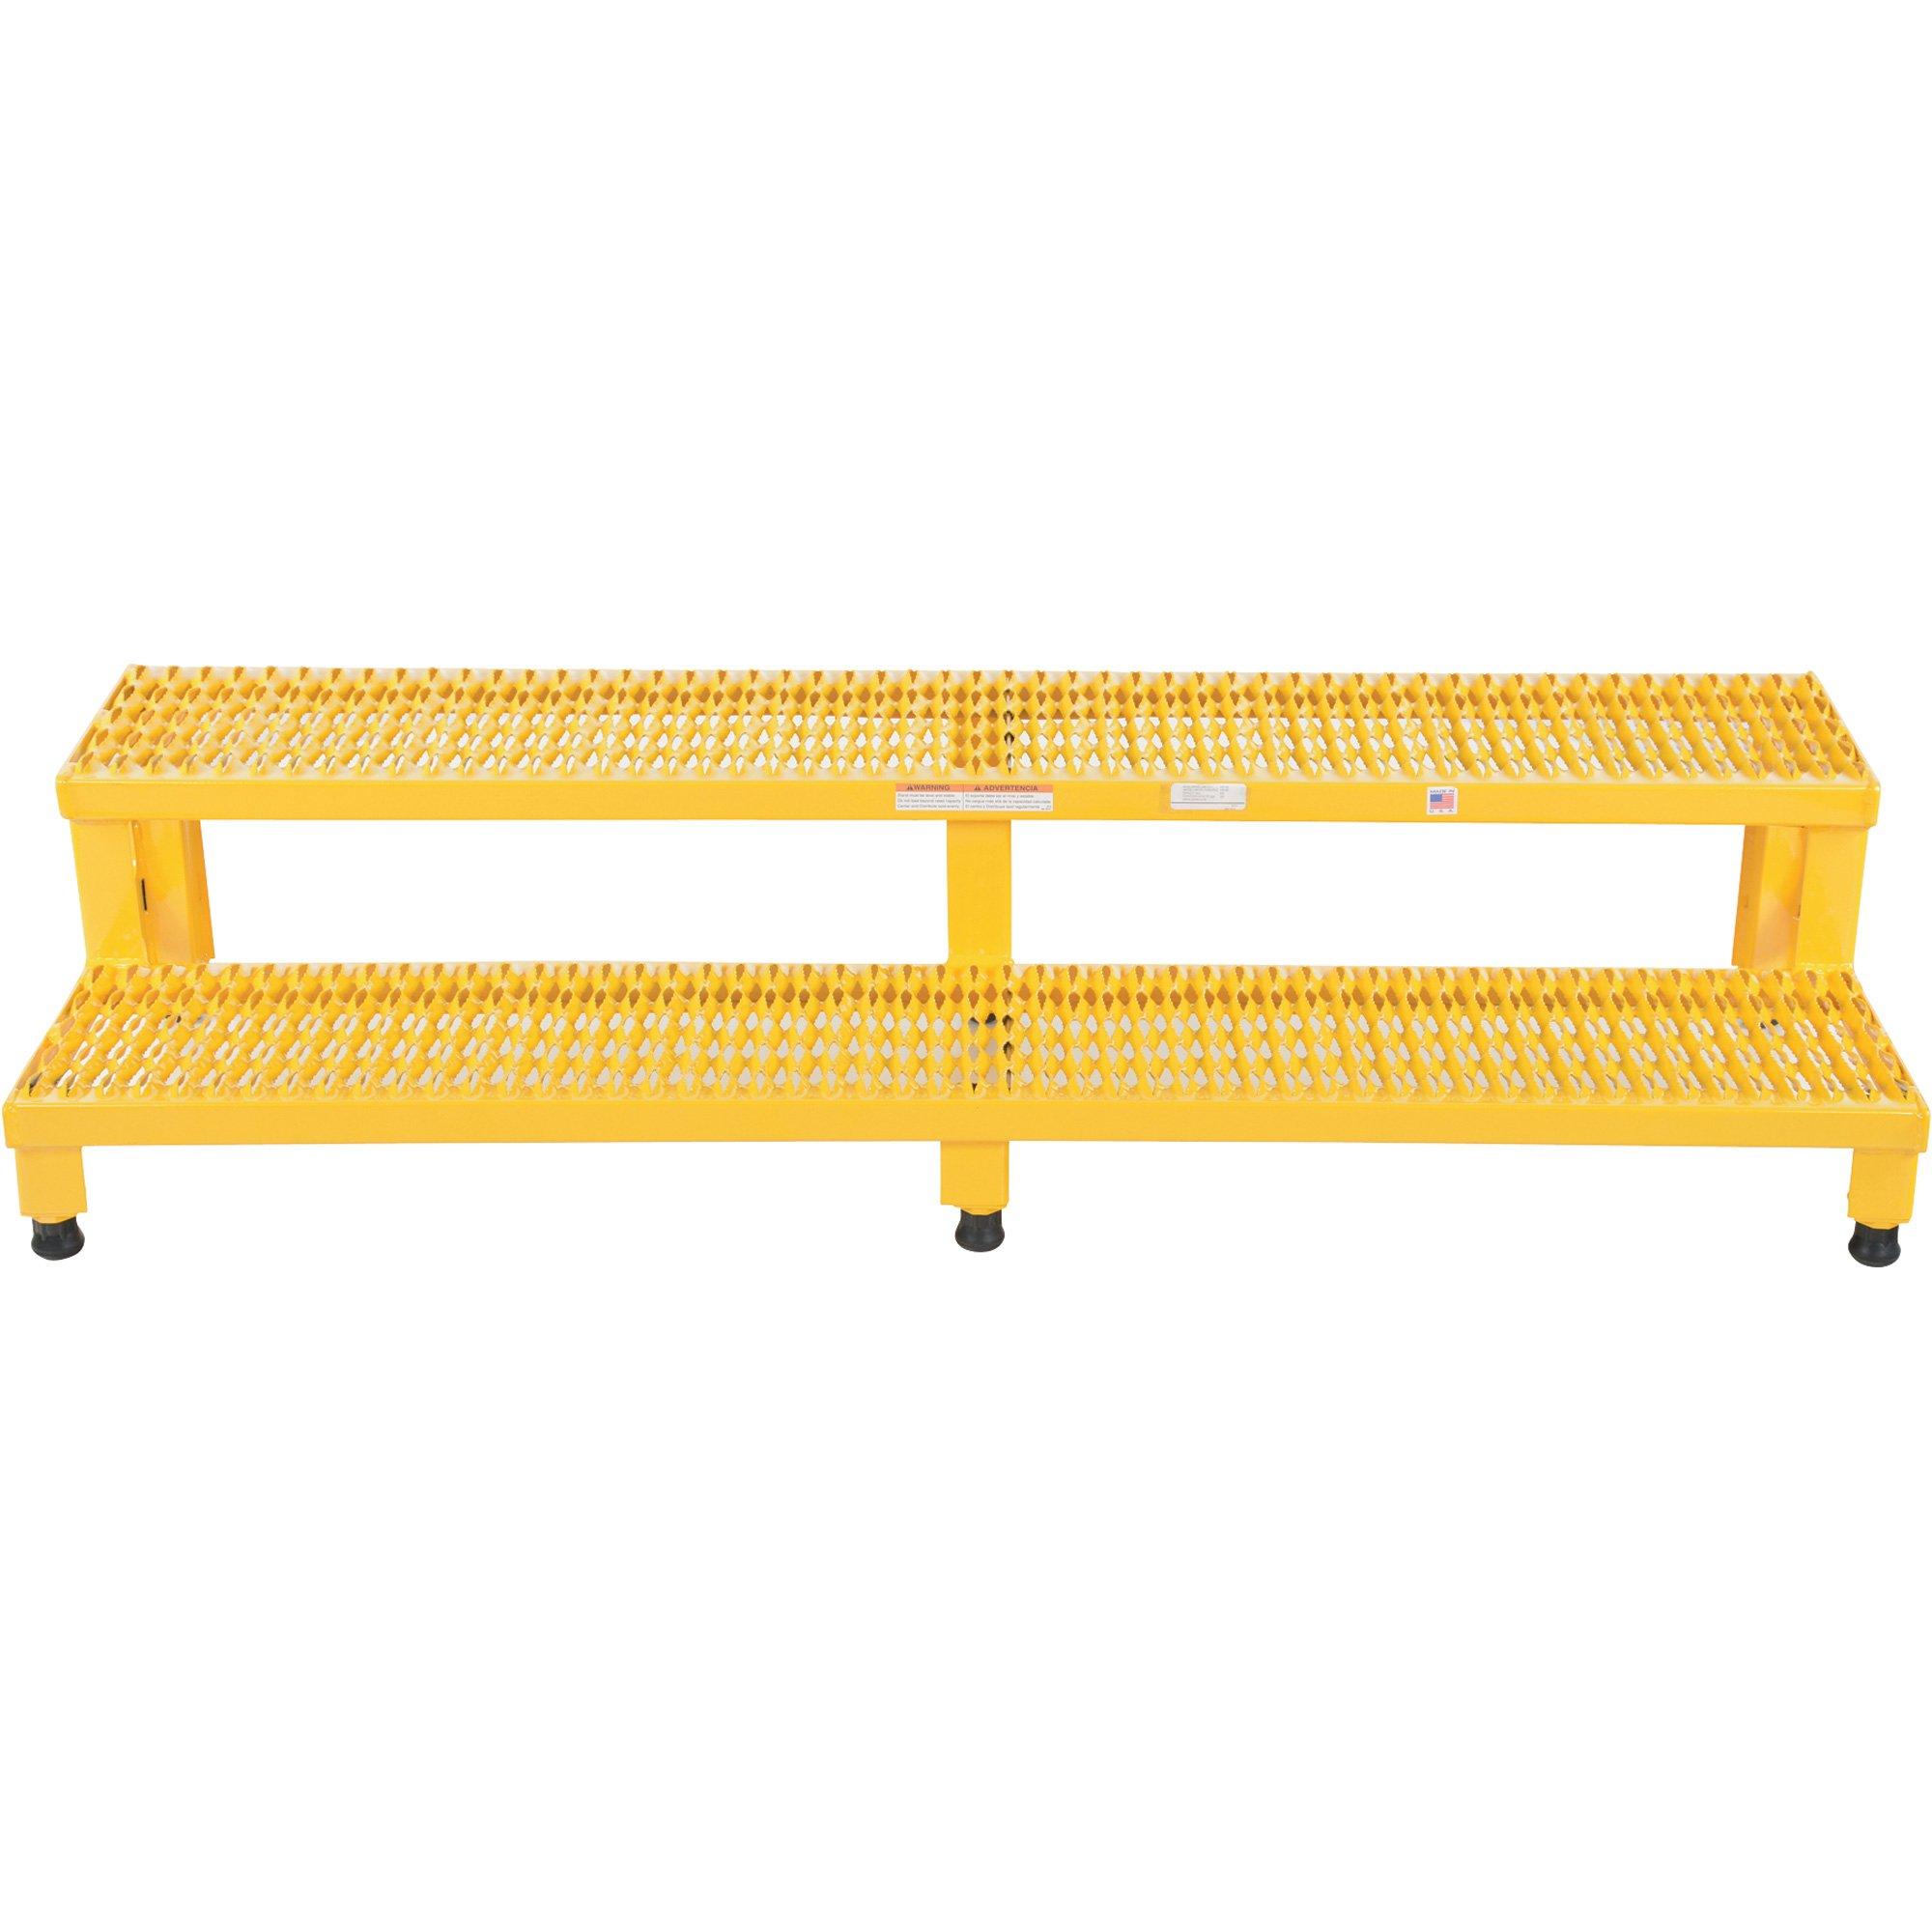 Vestil ASP-60 Steel Adjustable Step Mate Stand, 2 Step, 60'' x 23'', Yellow